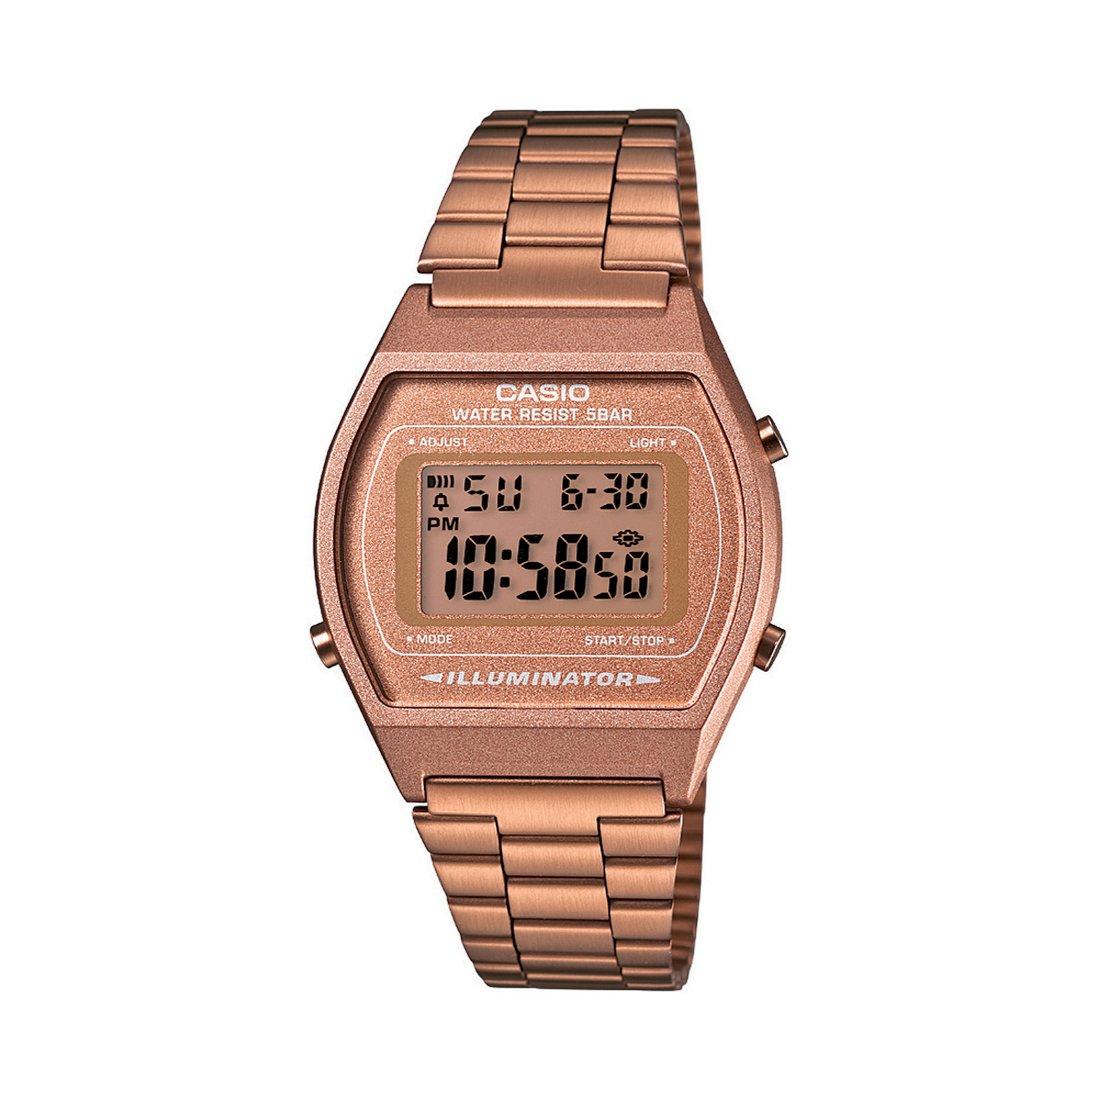 9c372ad78613 Casio Collection Unisex Retro Reloj de Pulsera - MedinaShopping